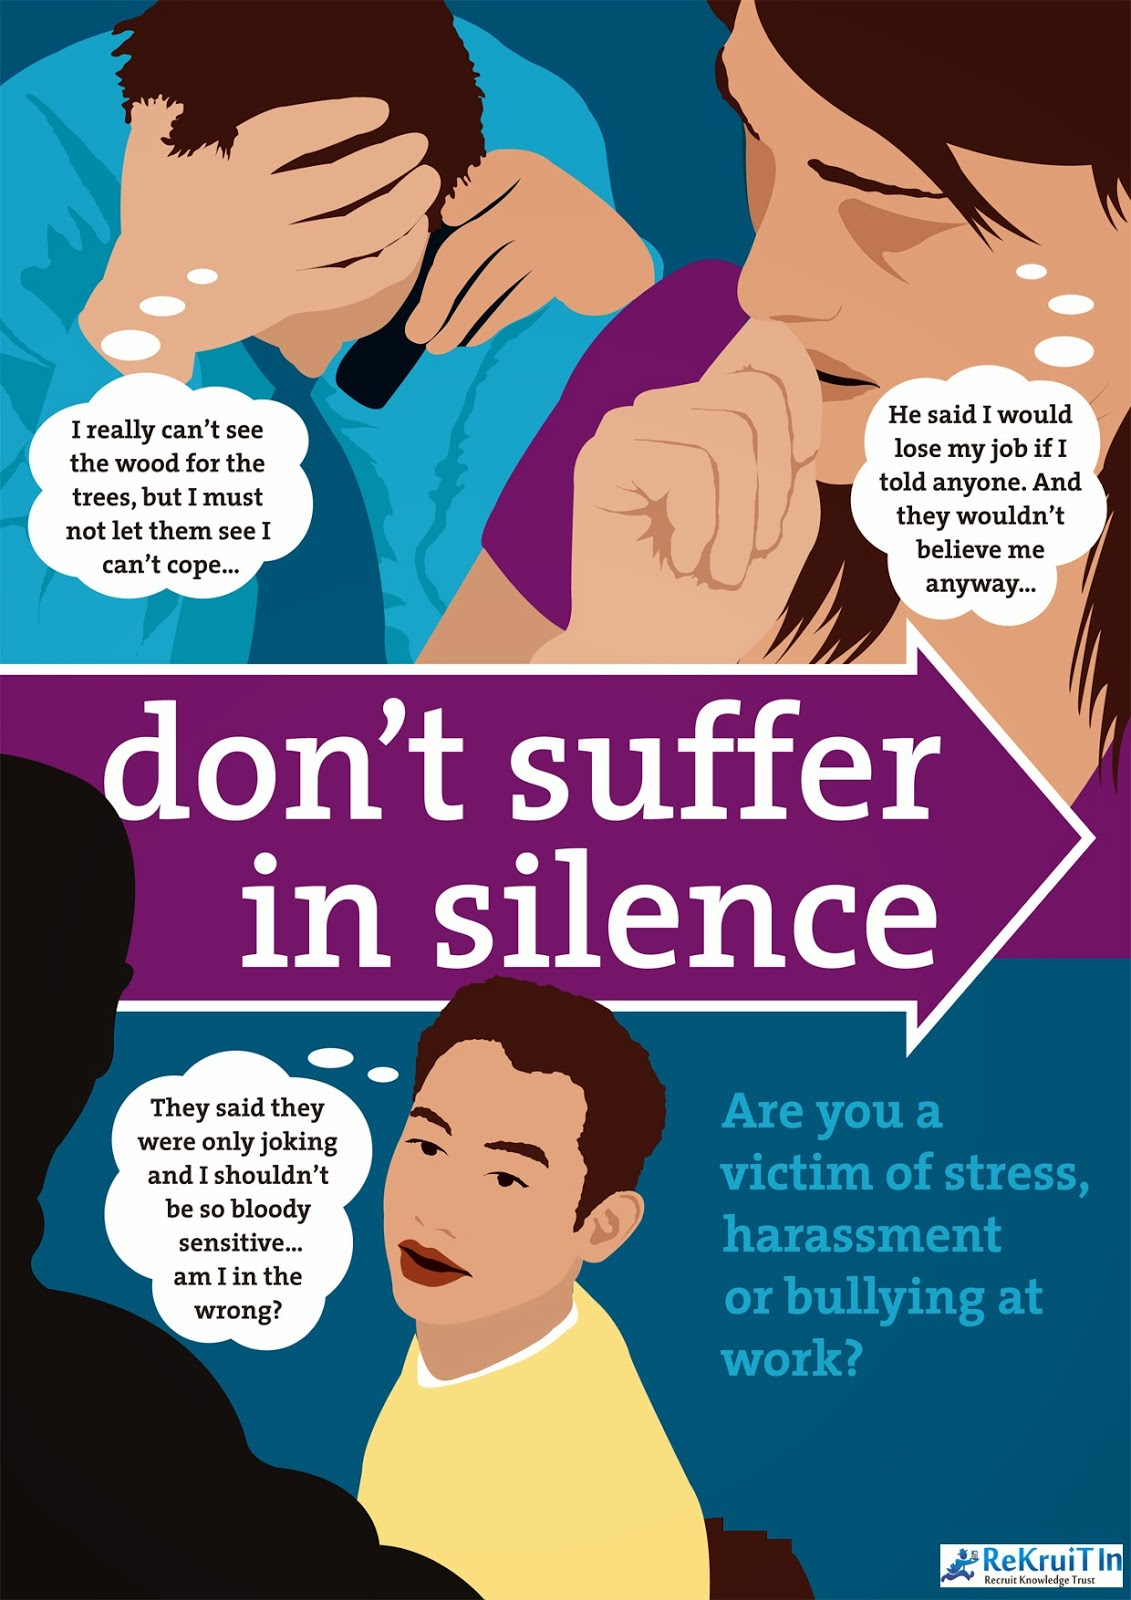 Bullying at workplace - ReKruiTIn.com